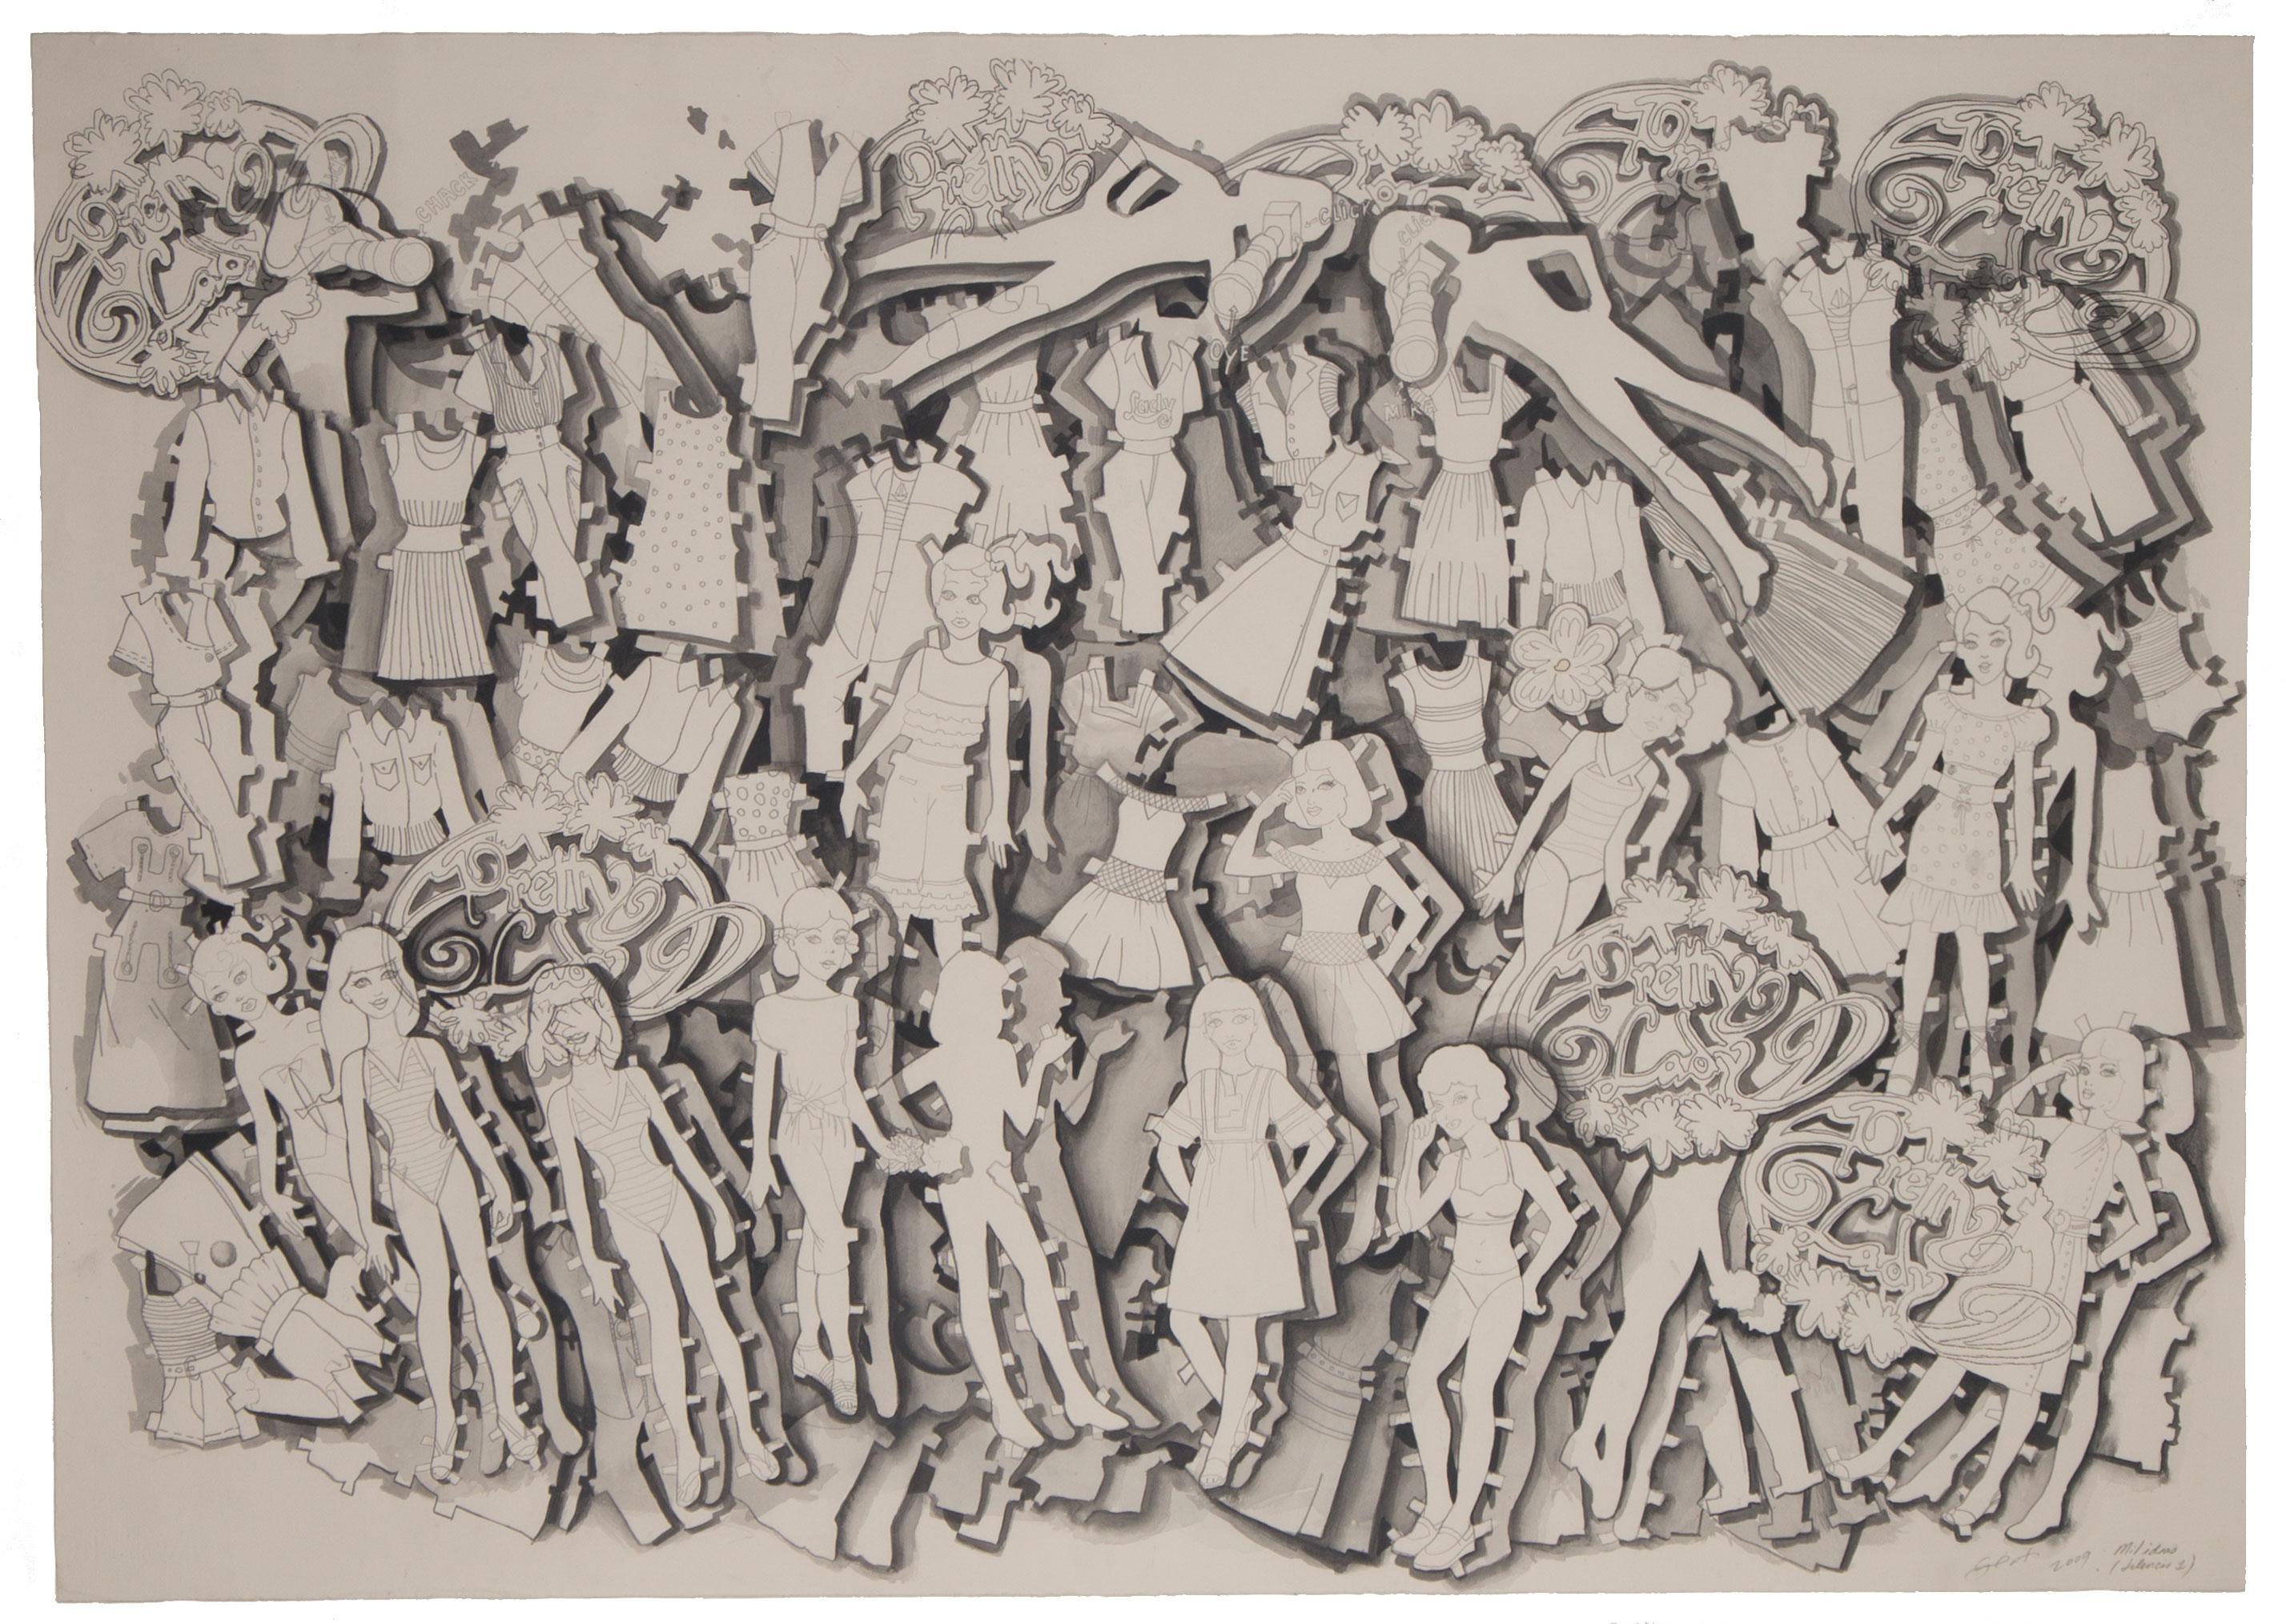 'Mil ideas' Gertrudis Rivalta